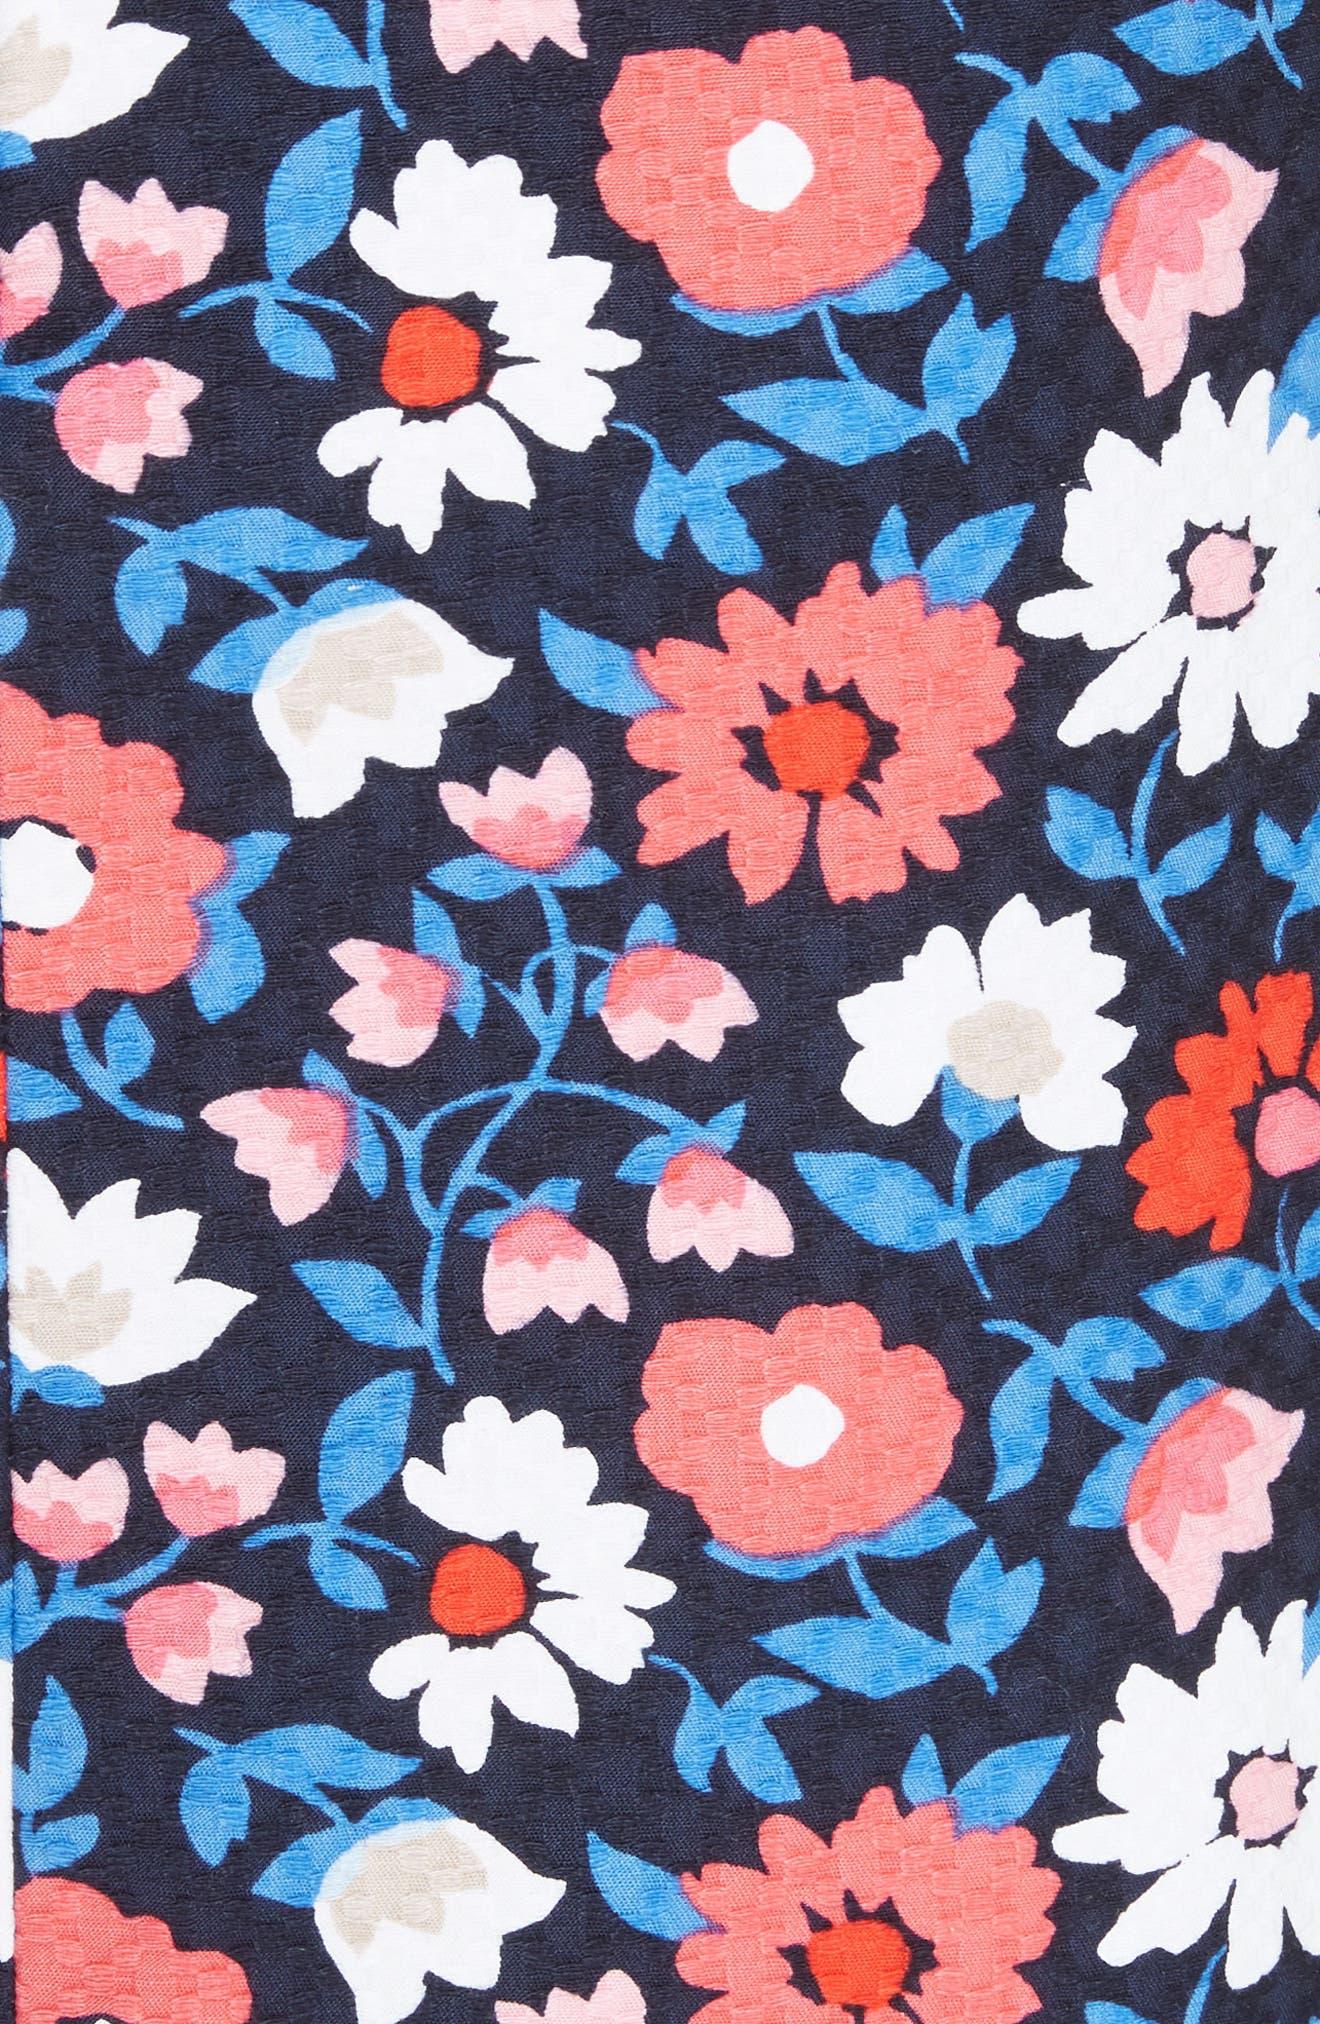 daisy jacquard A-line skirt,                             Alternate thumbnail 5, color,                             473